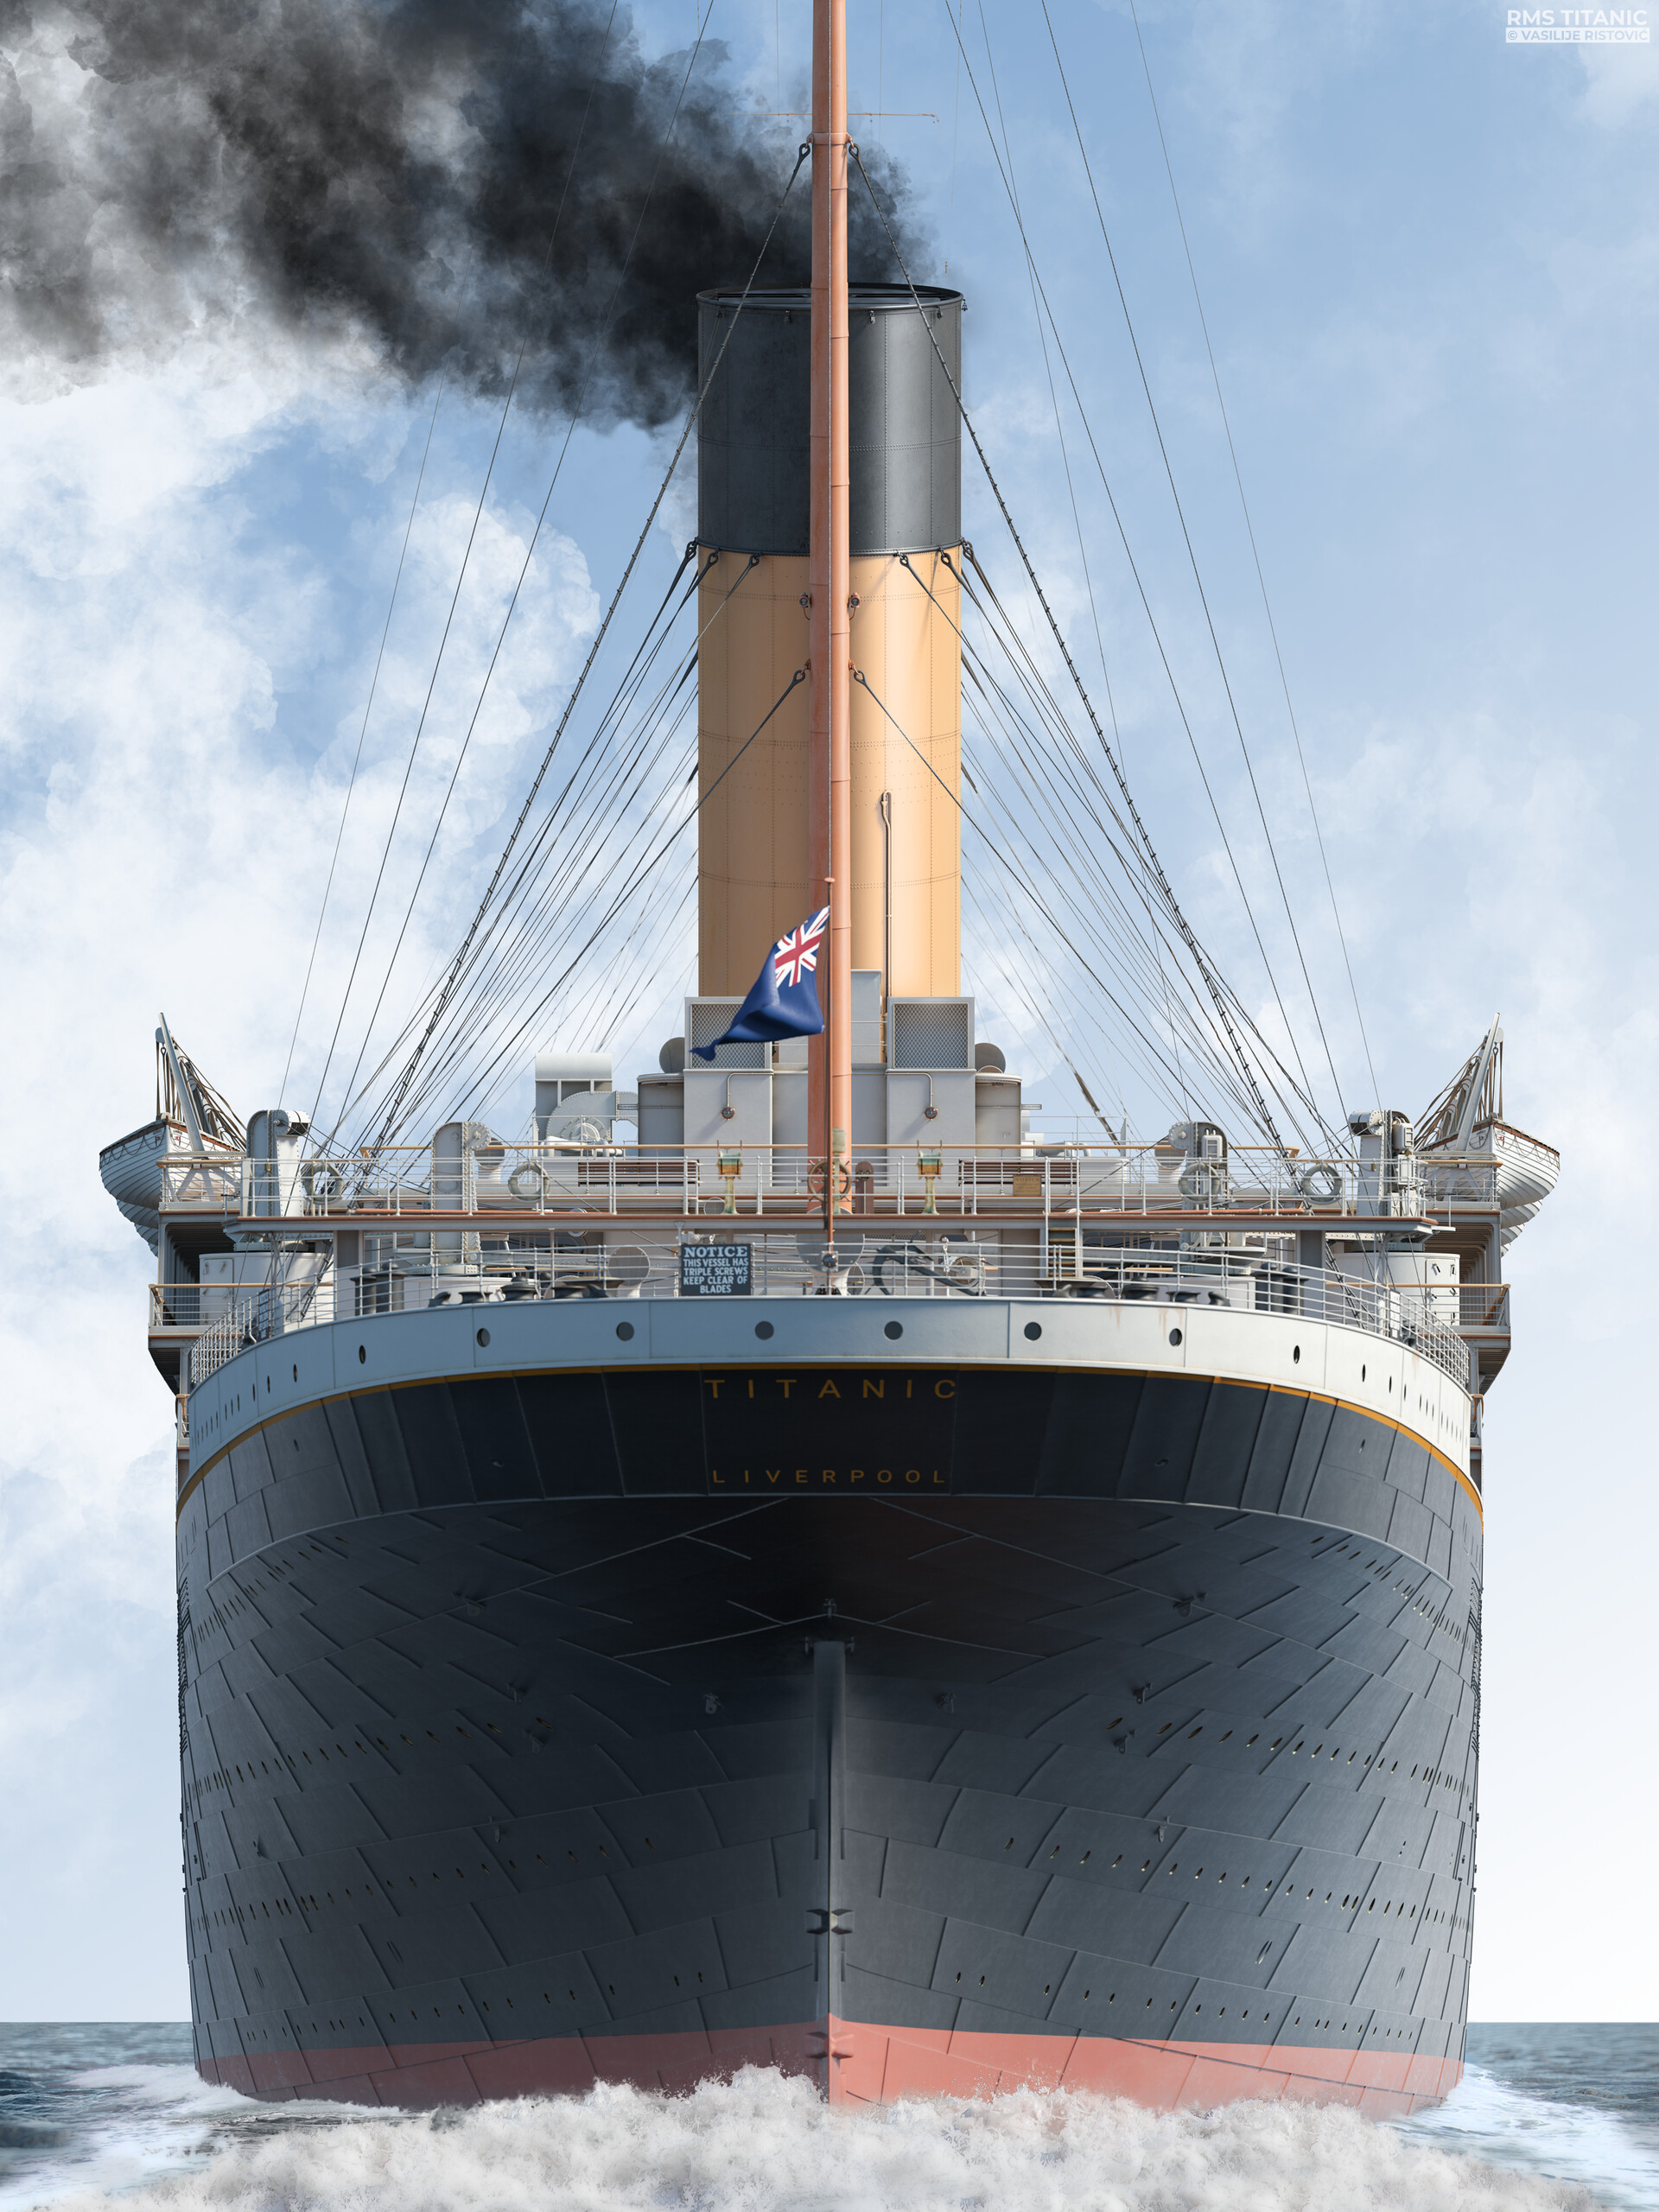 Montage Titanic Trumpeter 1/200 - Page 10 Vasilije-ristovic-rms-titanic-stern-view-web